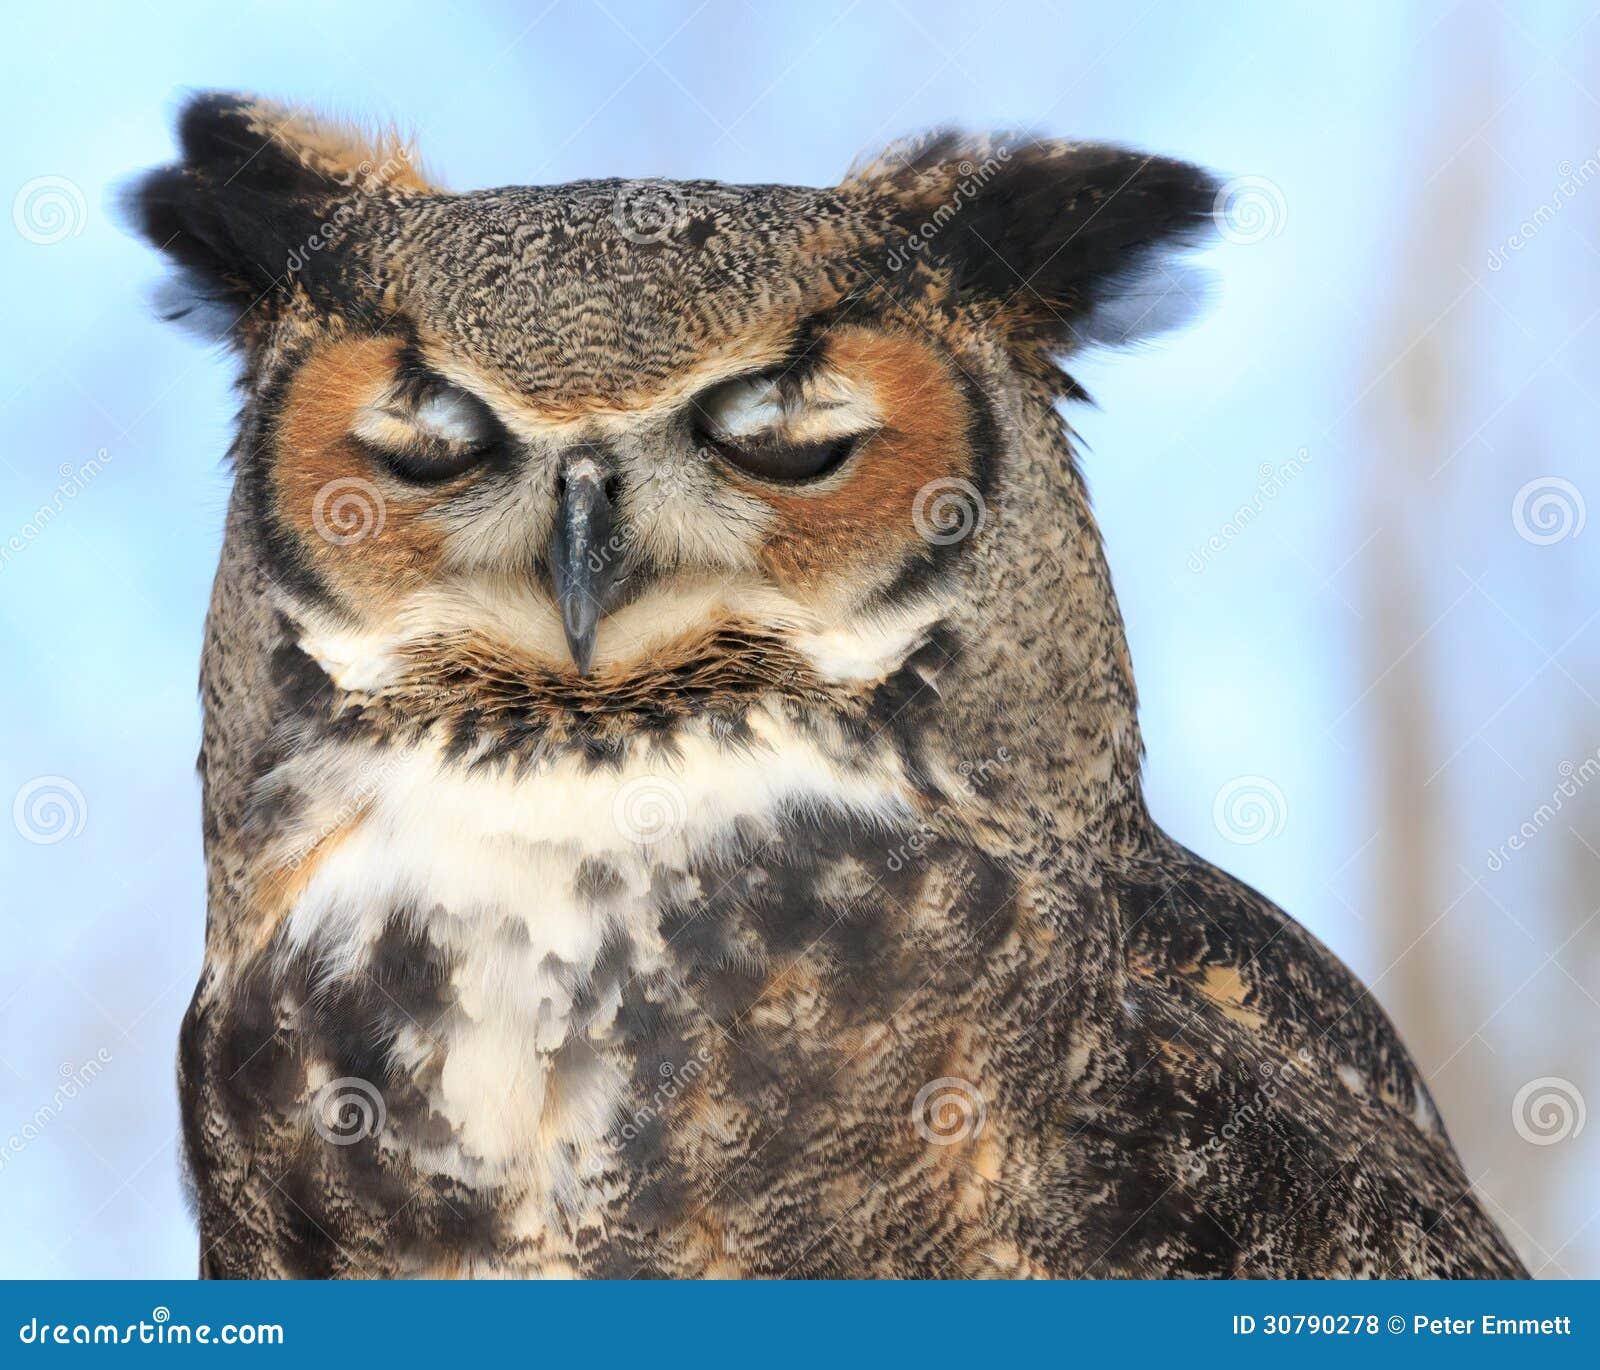 Owl On Blue Royalty Free Stock Photos - Image: 30790278